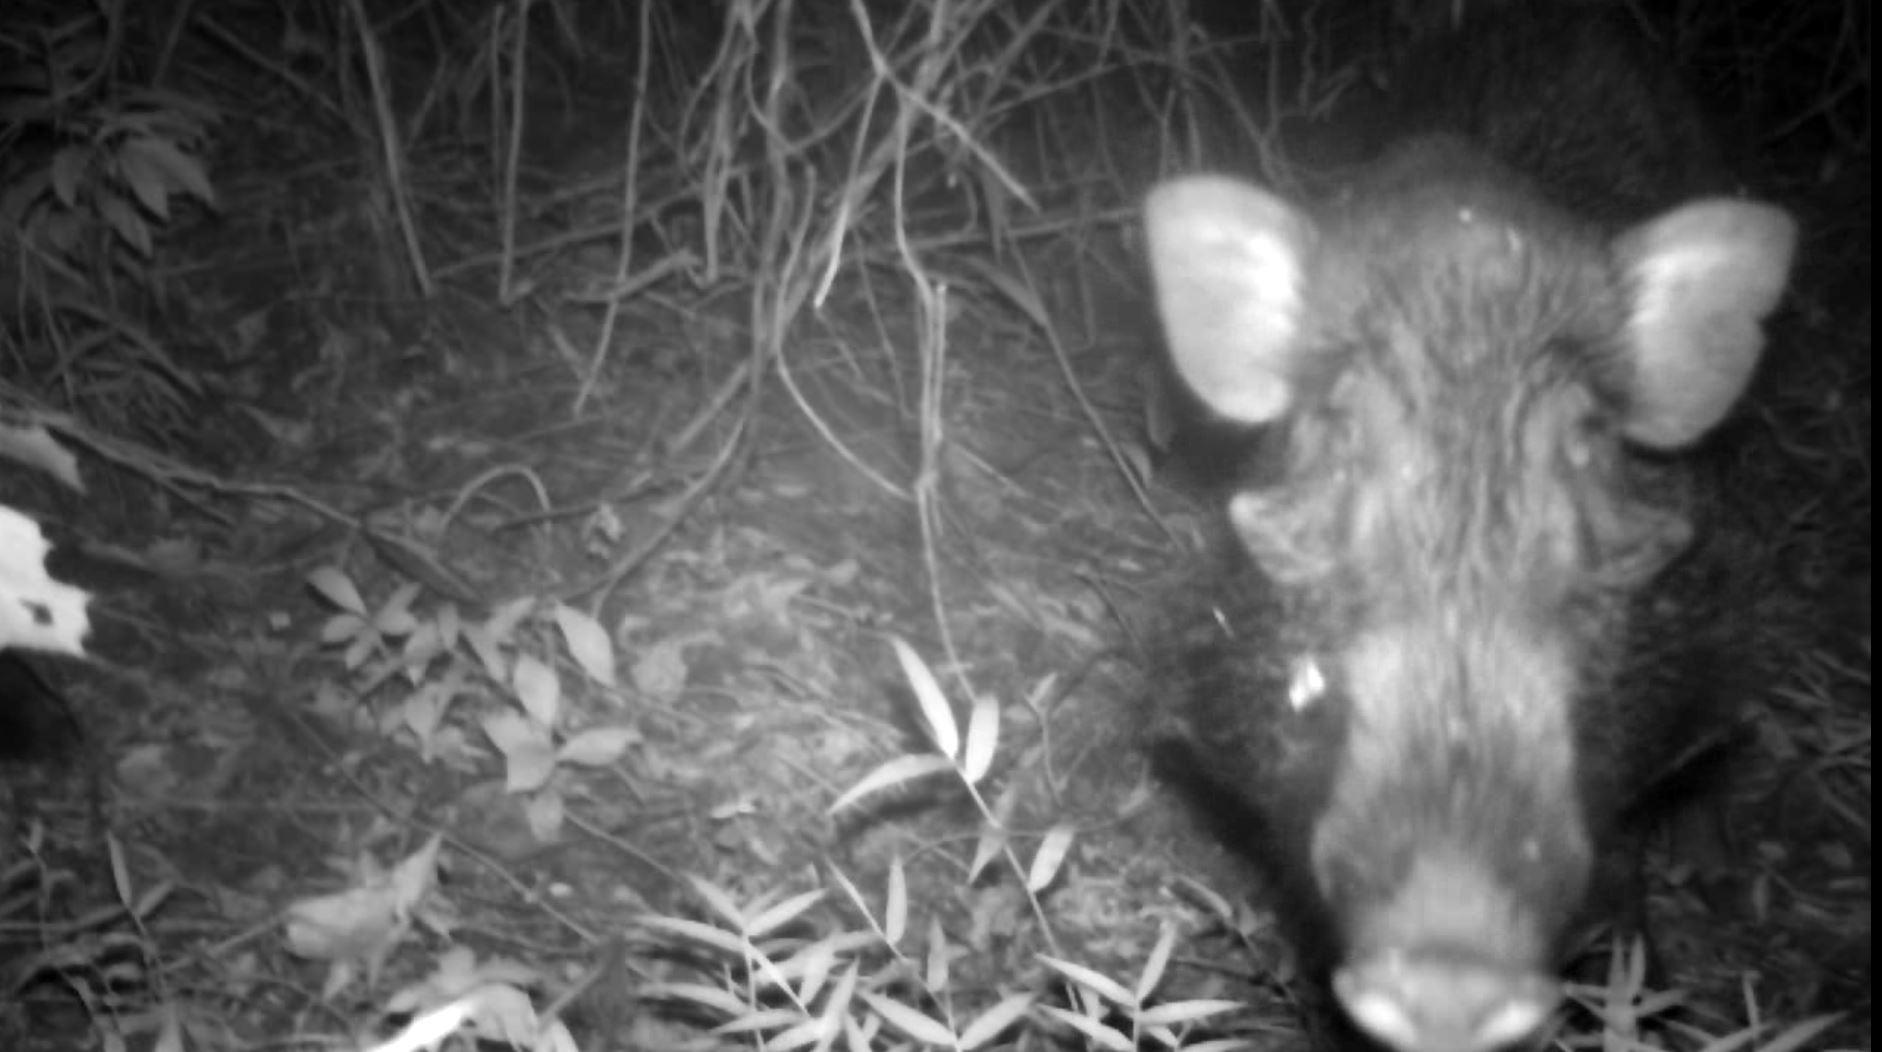 Javan warty pig captured on camera trap